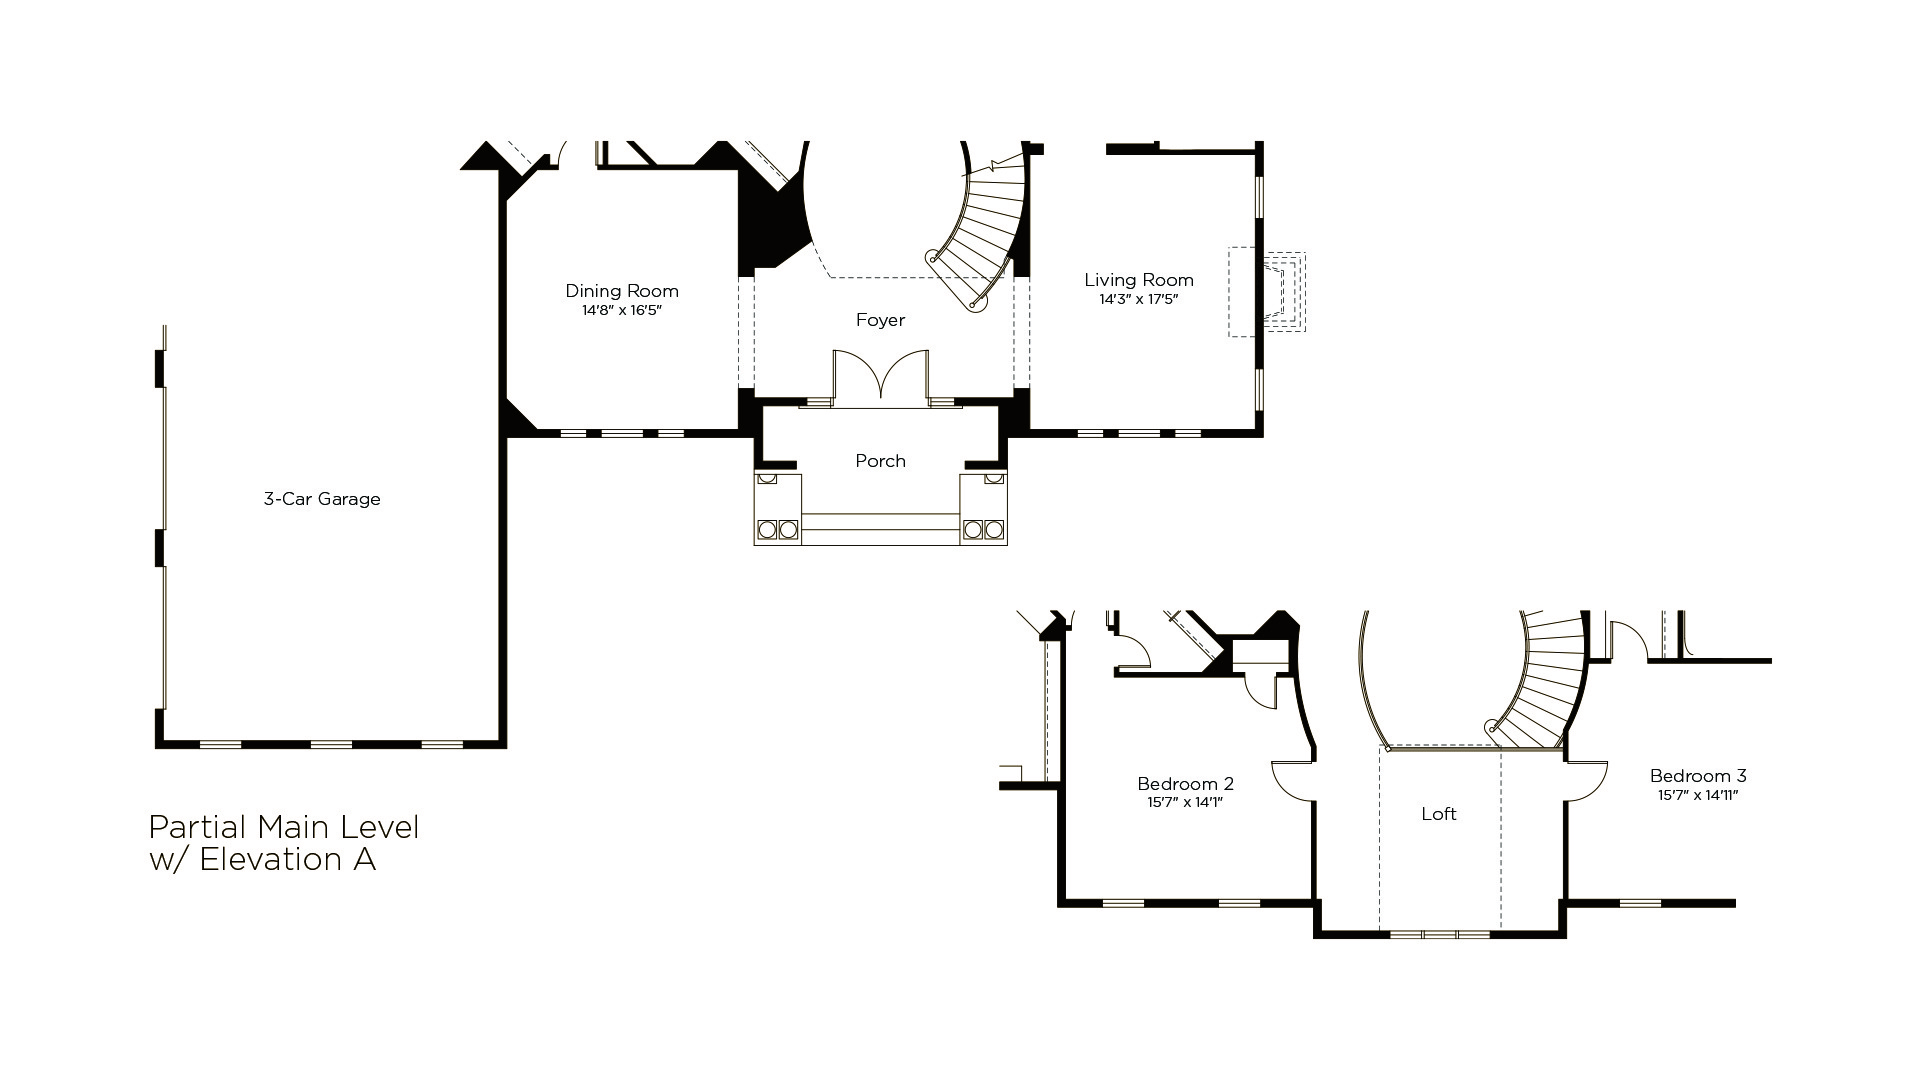 Winthrop - Summerwood Series - Optional Elevation A Floorplan